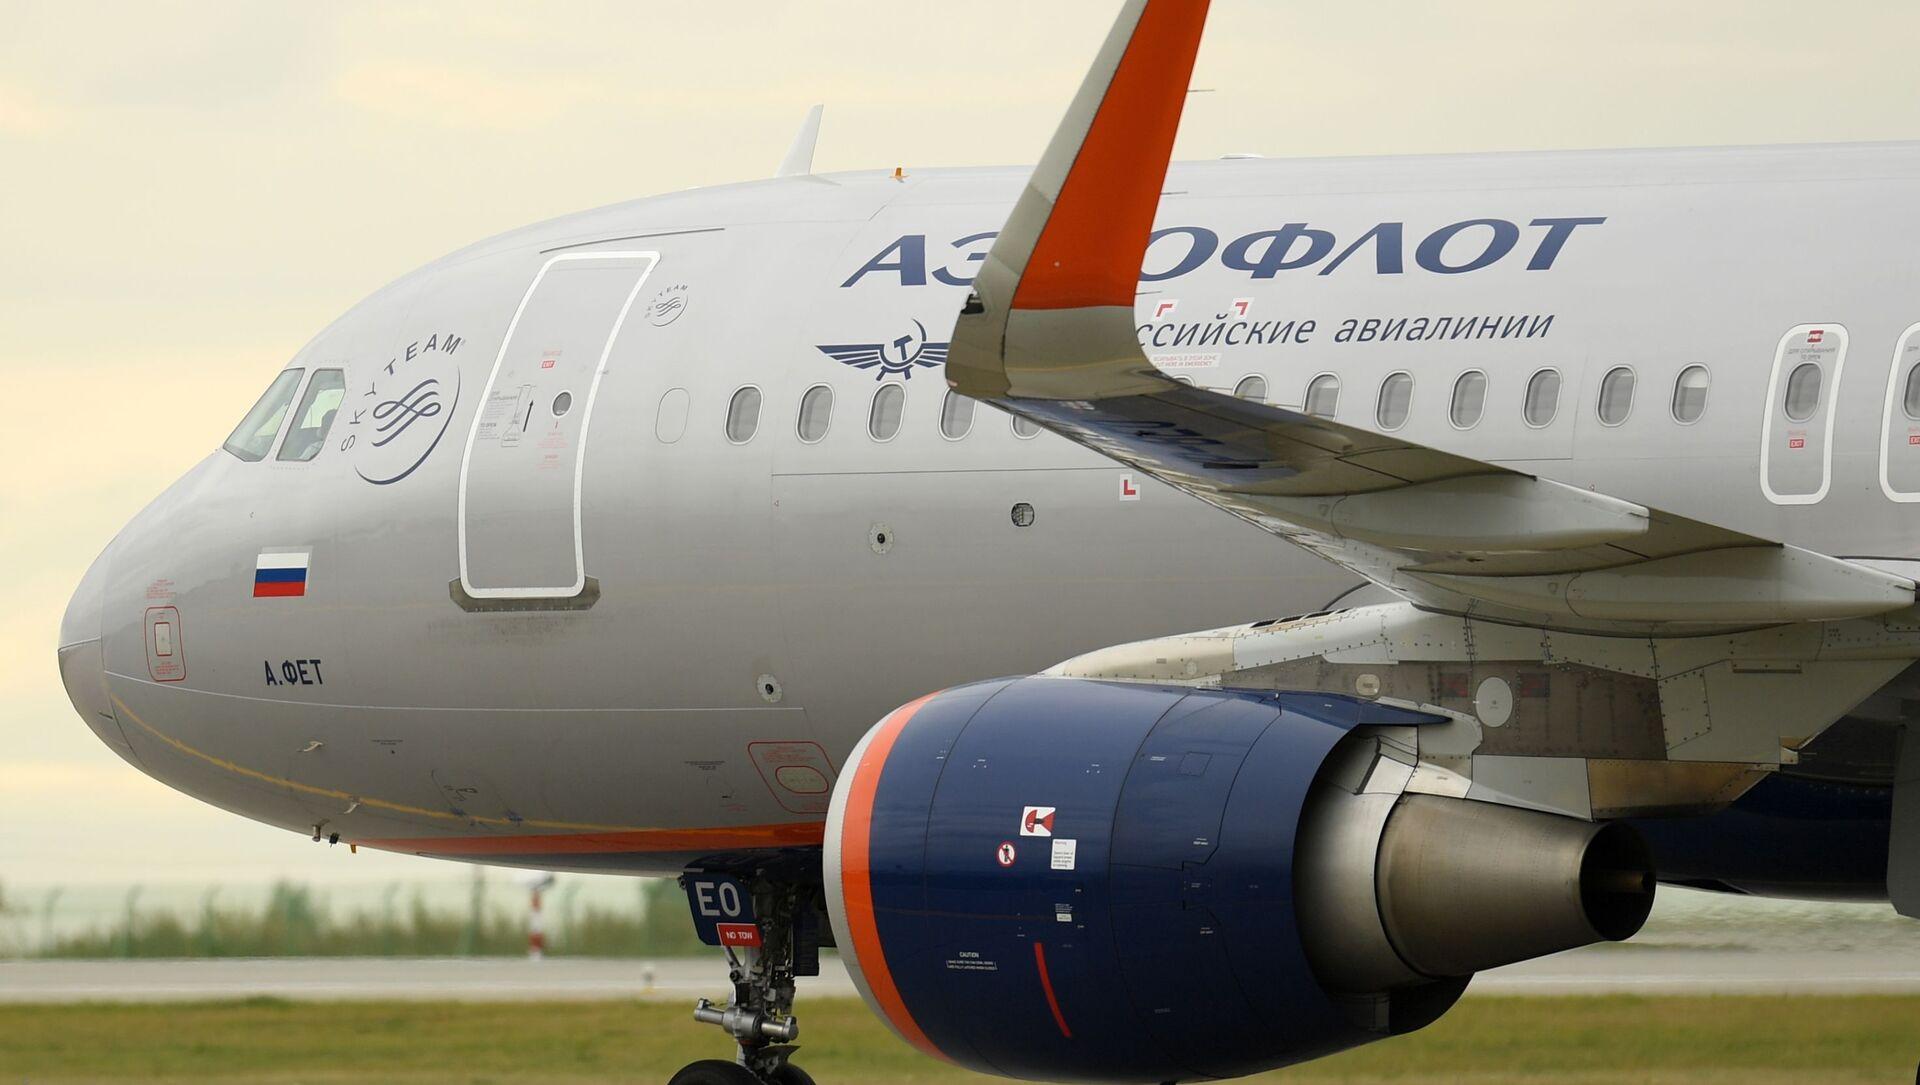 Airbus-A320, Aerofłot - Sputnik Polska, 1920, 06.02.2021